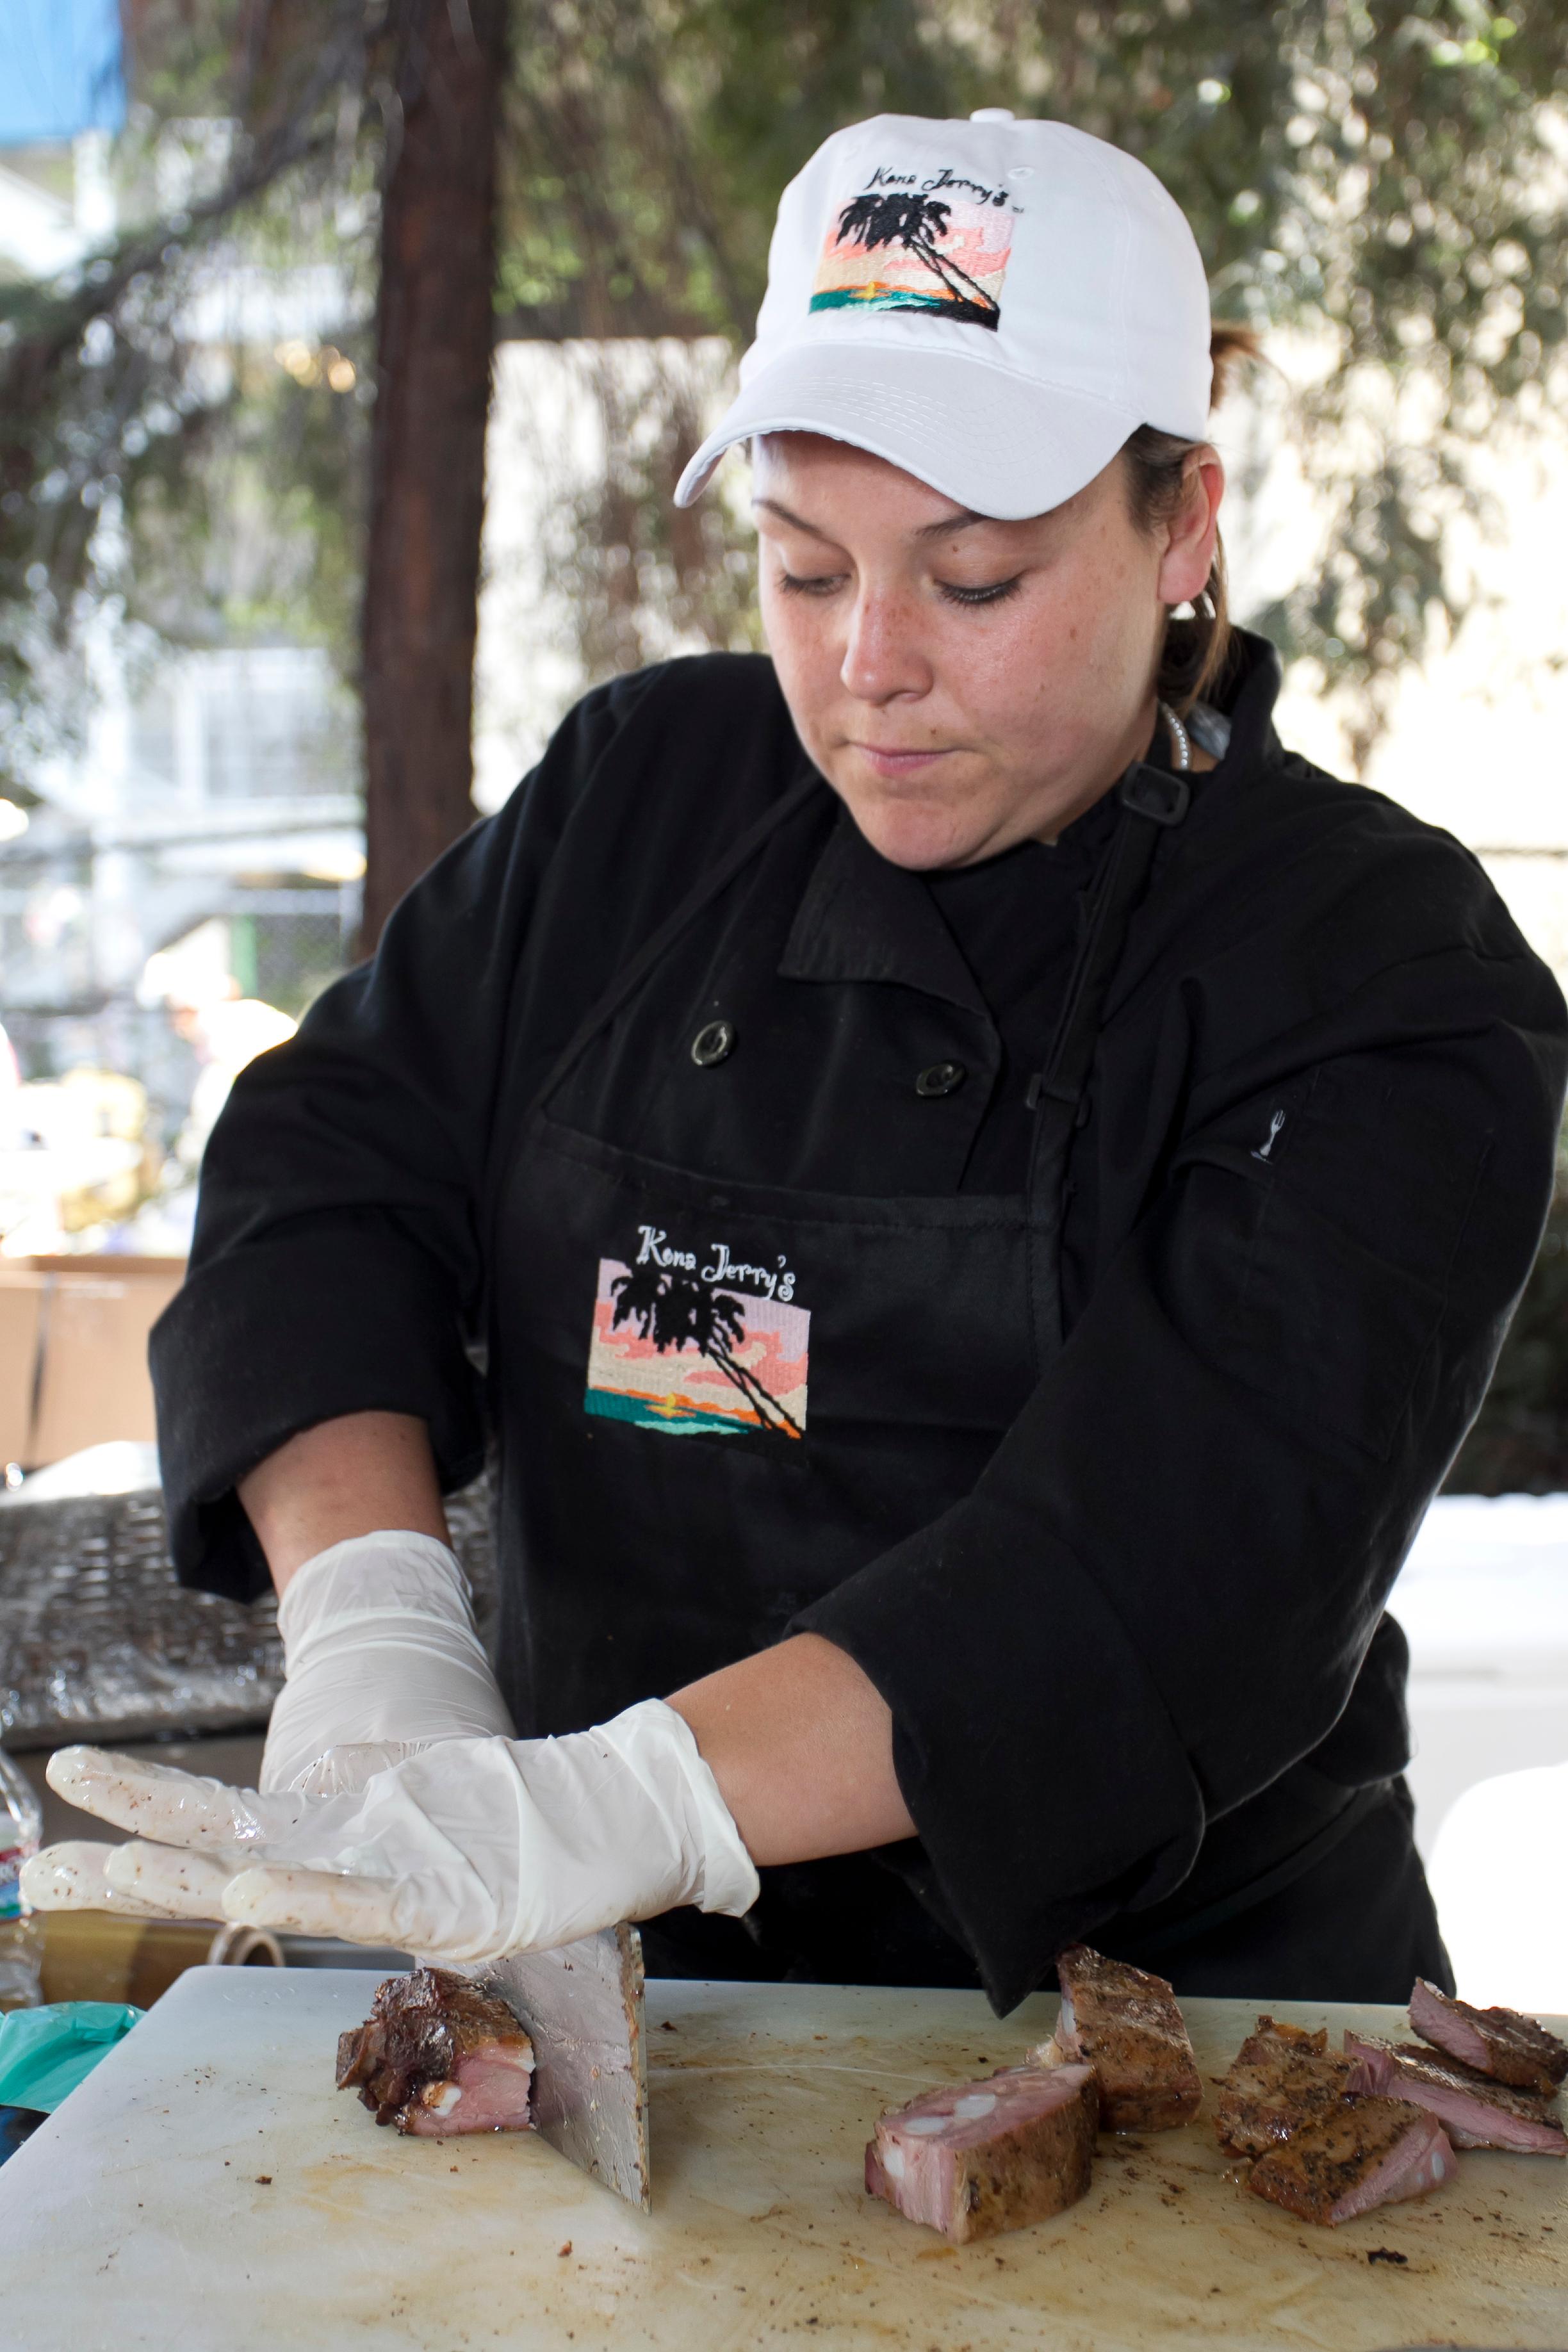 Kona Jerry's BBQ Catering